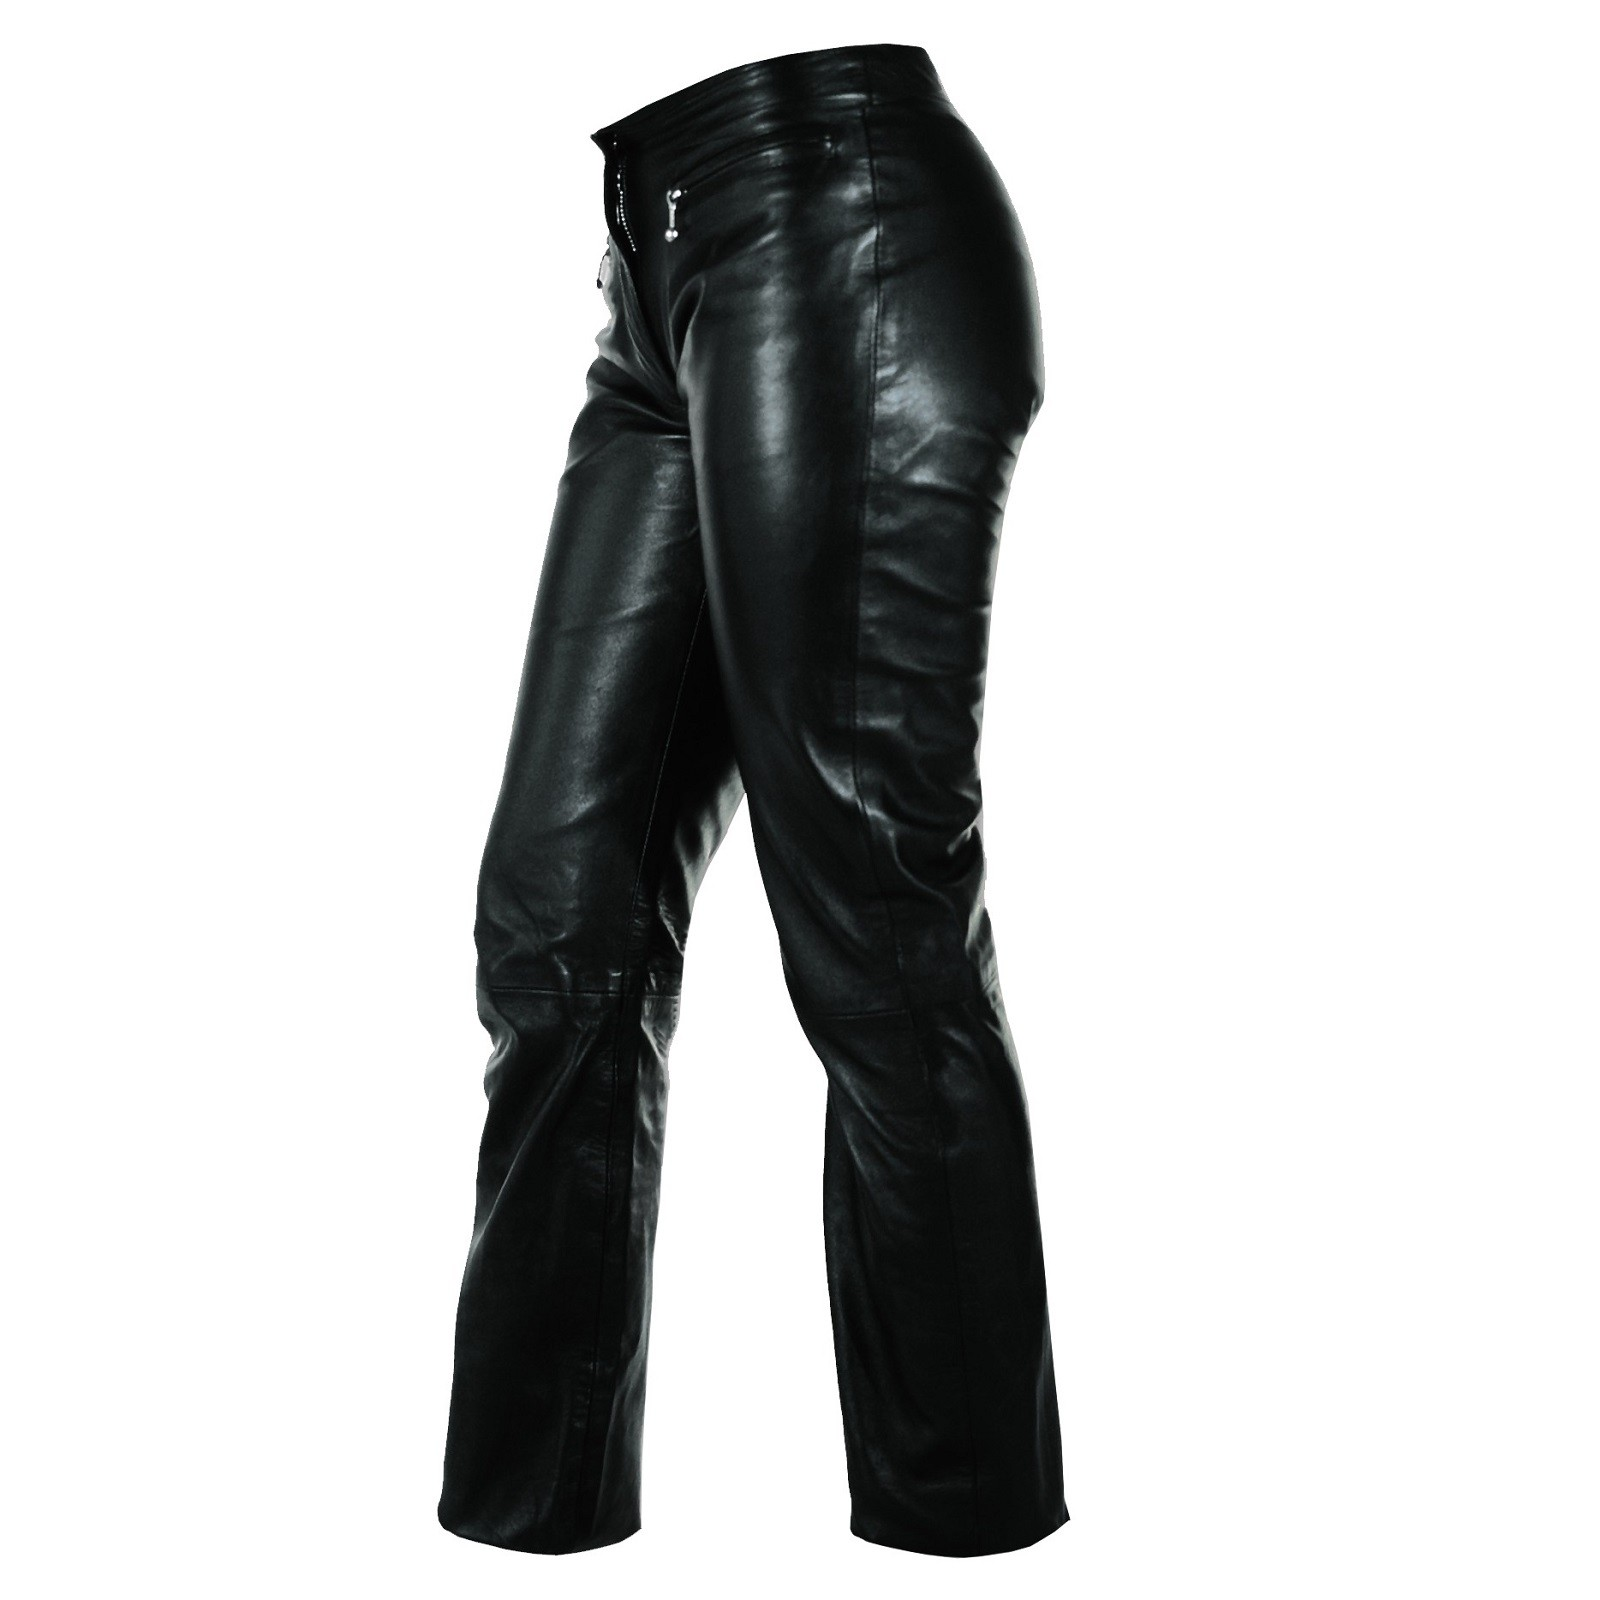 new product 59f1c aee47 Pantaloni Pelle Vitello Donna Morbido Vita Bassa Jeans Moto Custom Lady